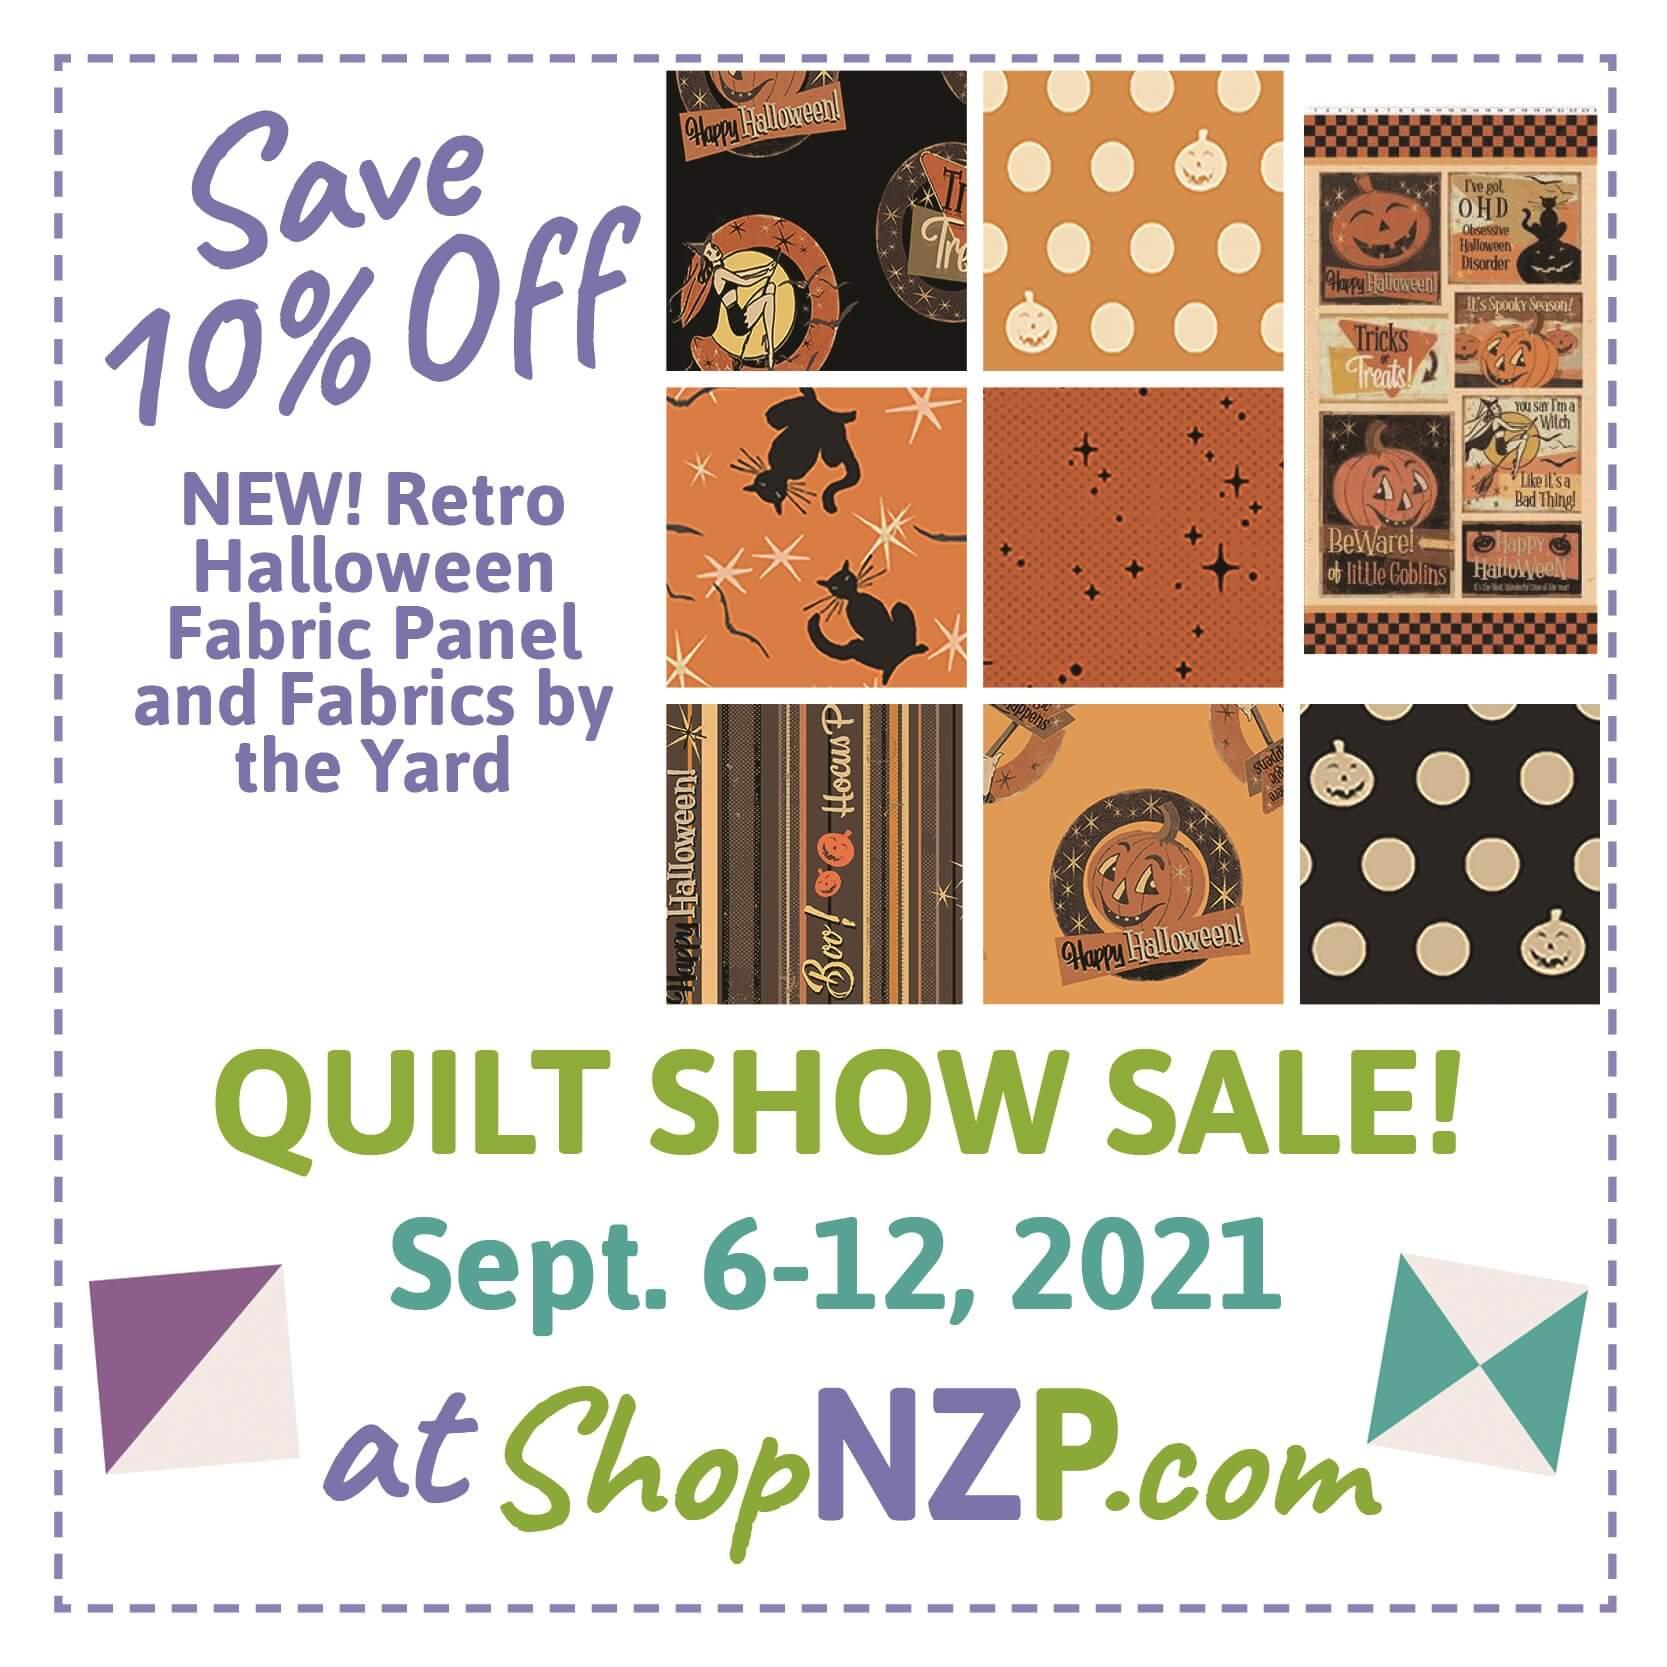 Save 10 Percent off Retro Halloween Fabric Panel and Fabrics at Nancy Zieman Productions at ShopNZP